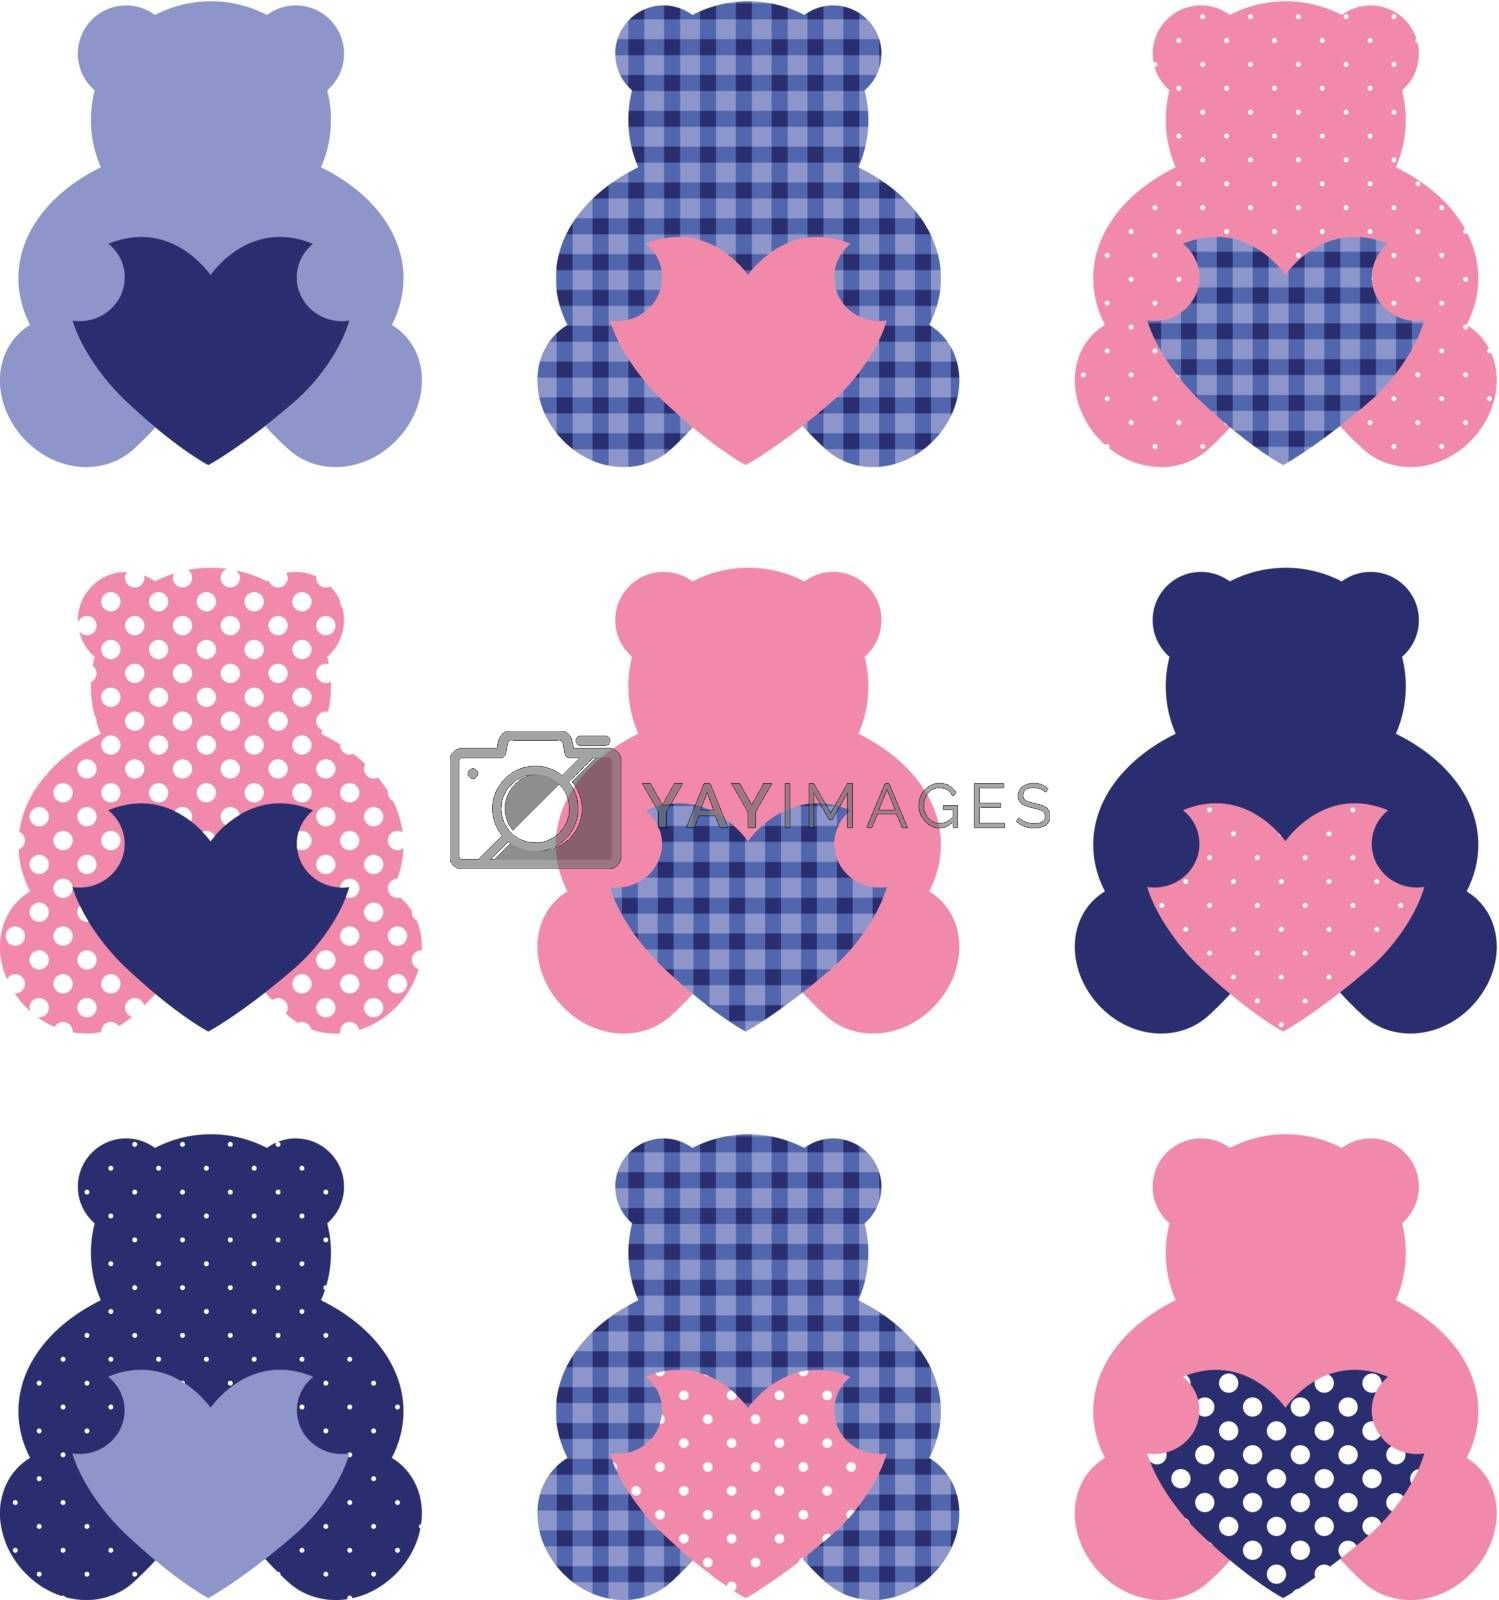 Retro abstract teddy bear collection. Vector Illustration